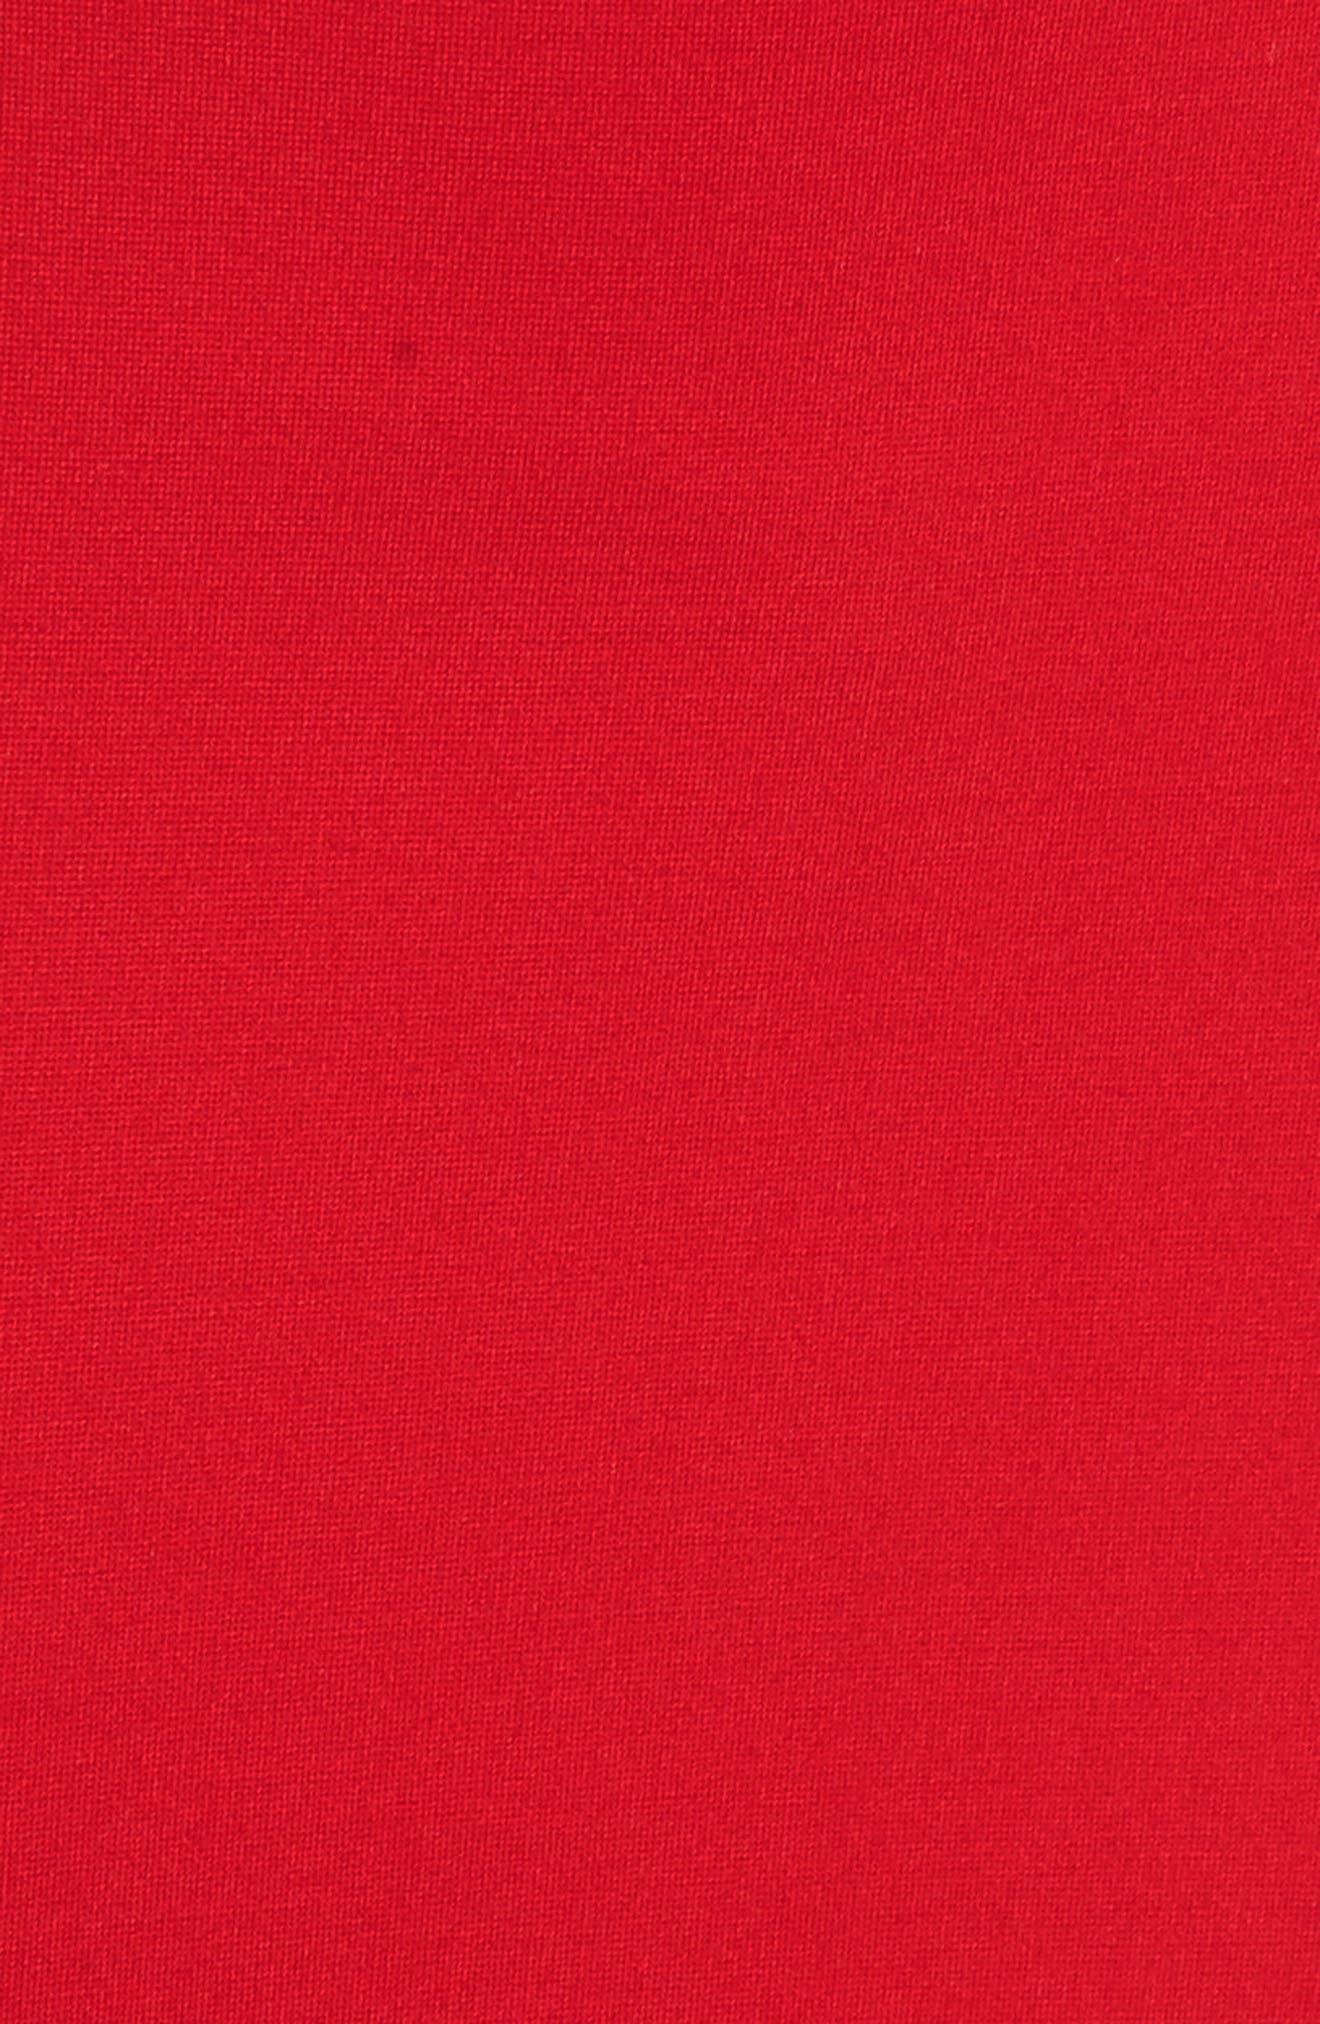 Alternate Image 5  - Felicity & Coco Monrow Flutter Hem Midi Dress (Nordstrom Exclusive)